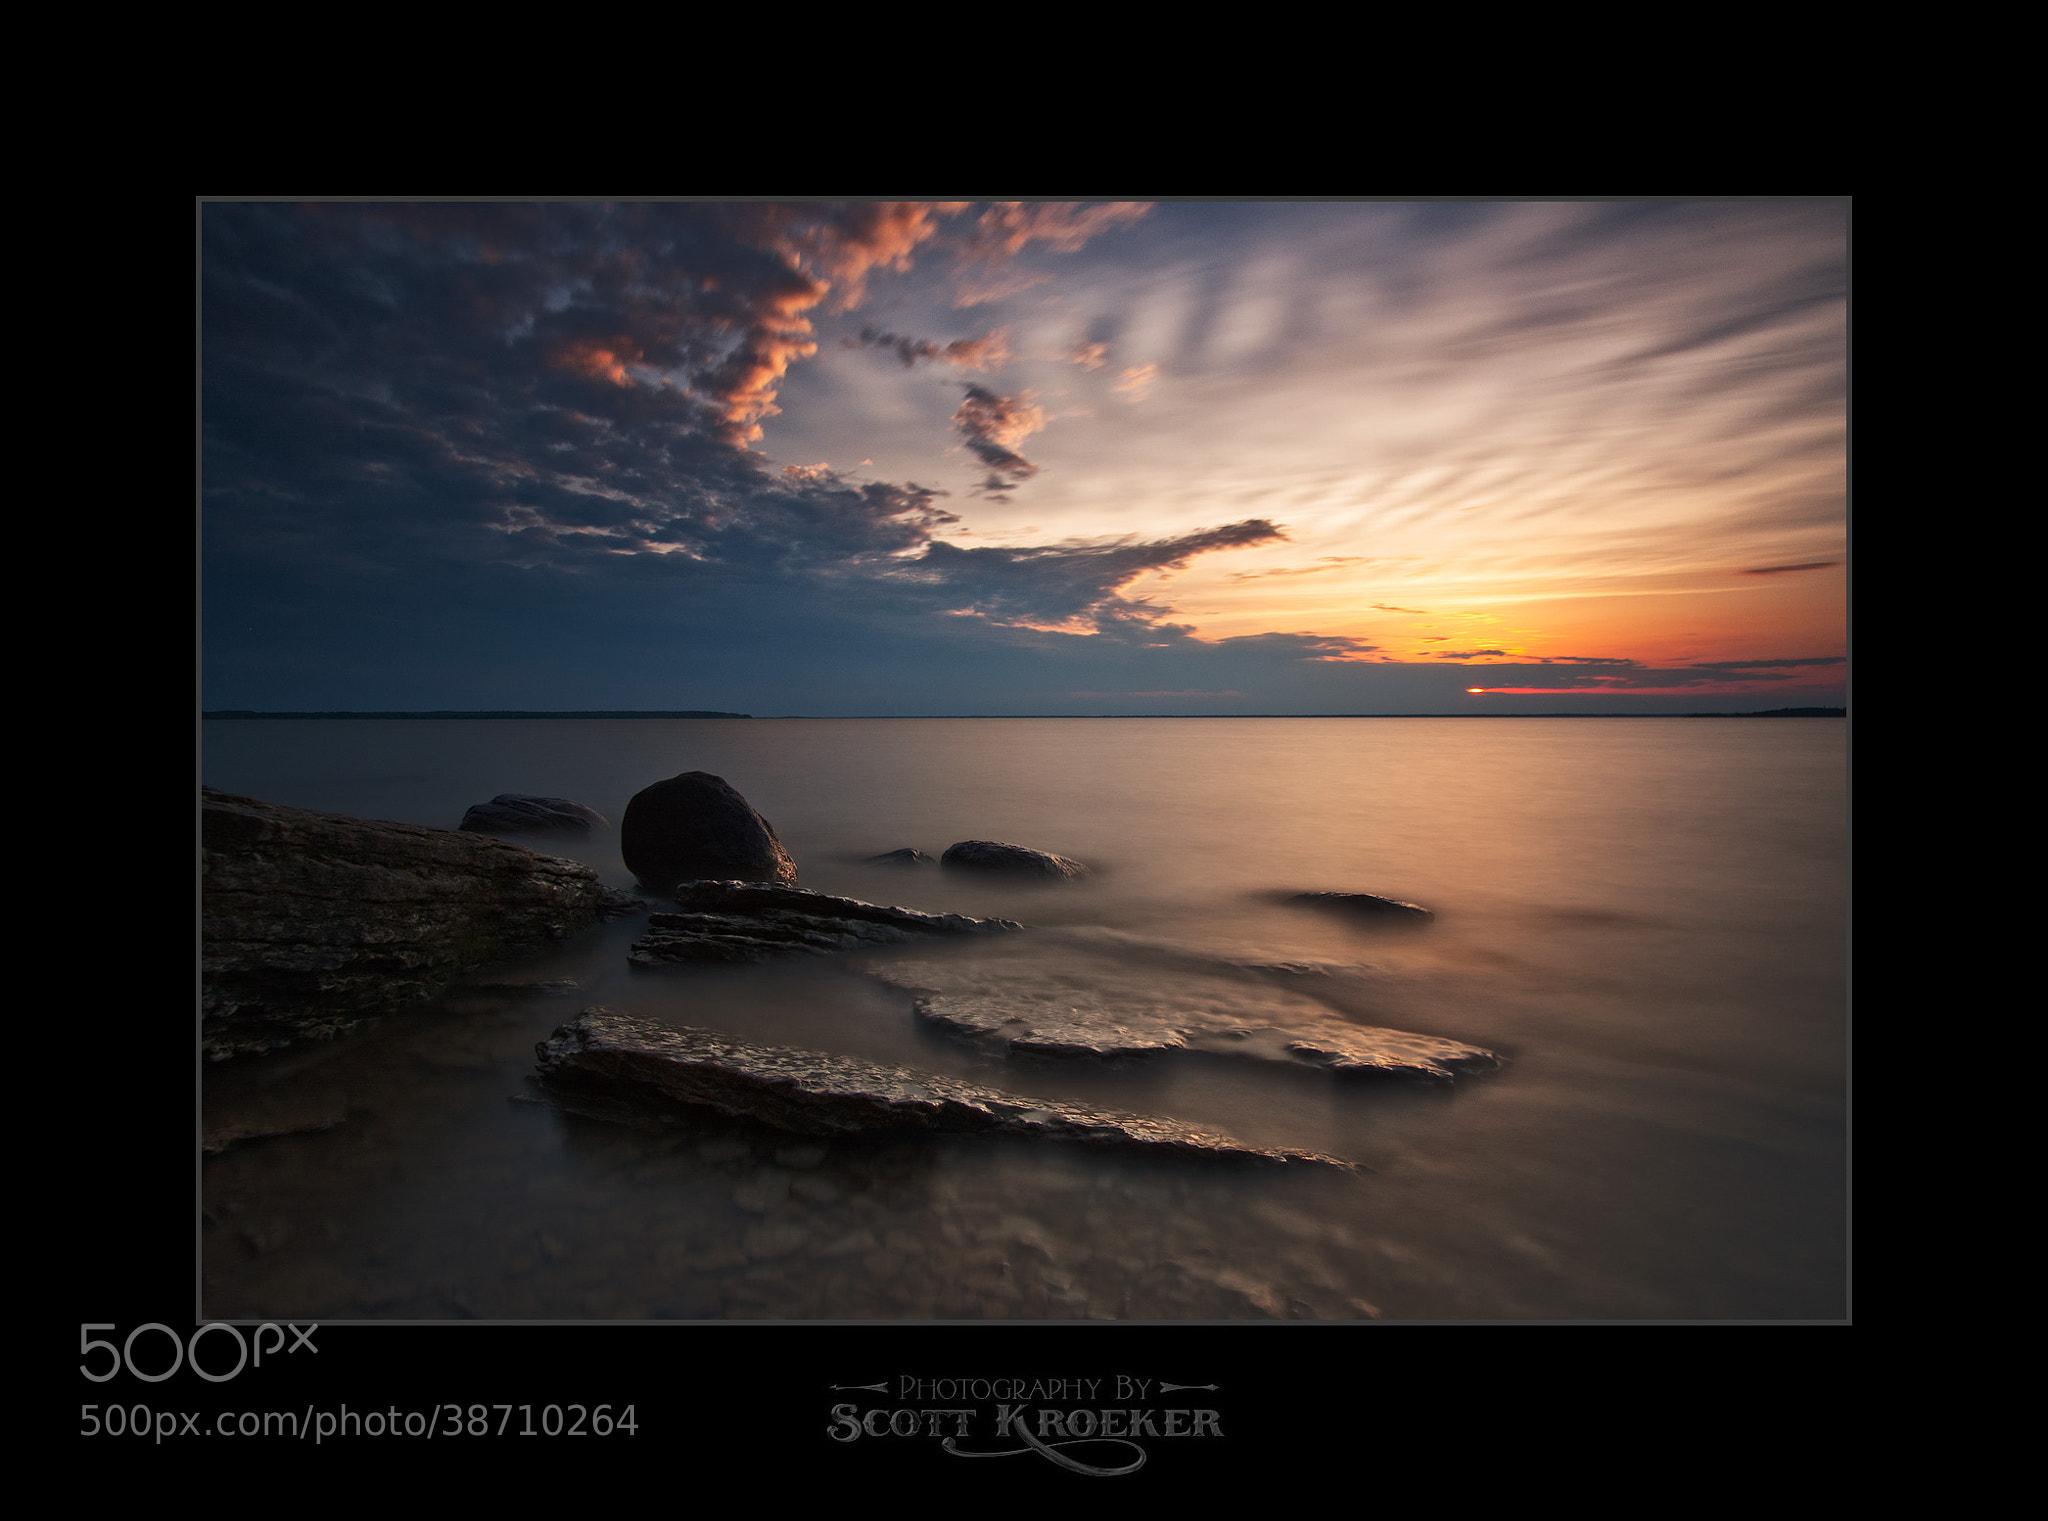 Photograph Storm's Edge by Scott Kroeker on 500px